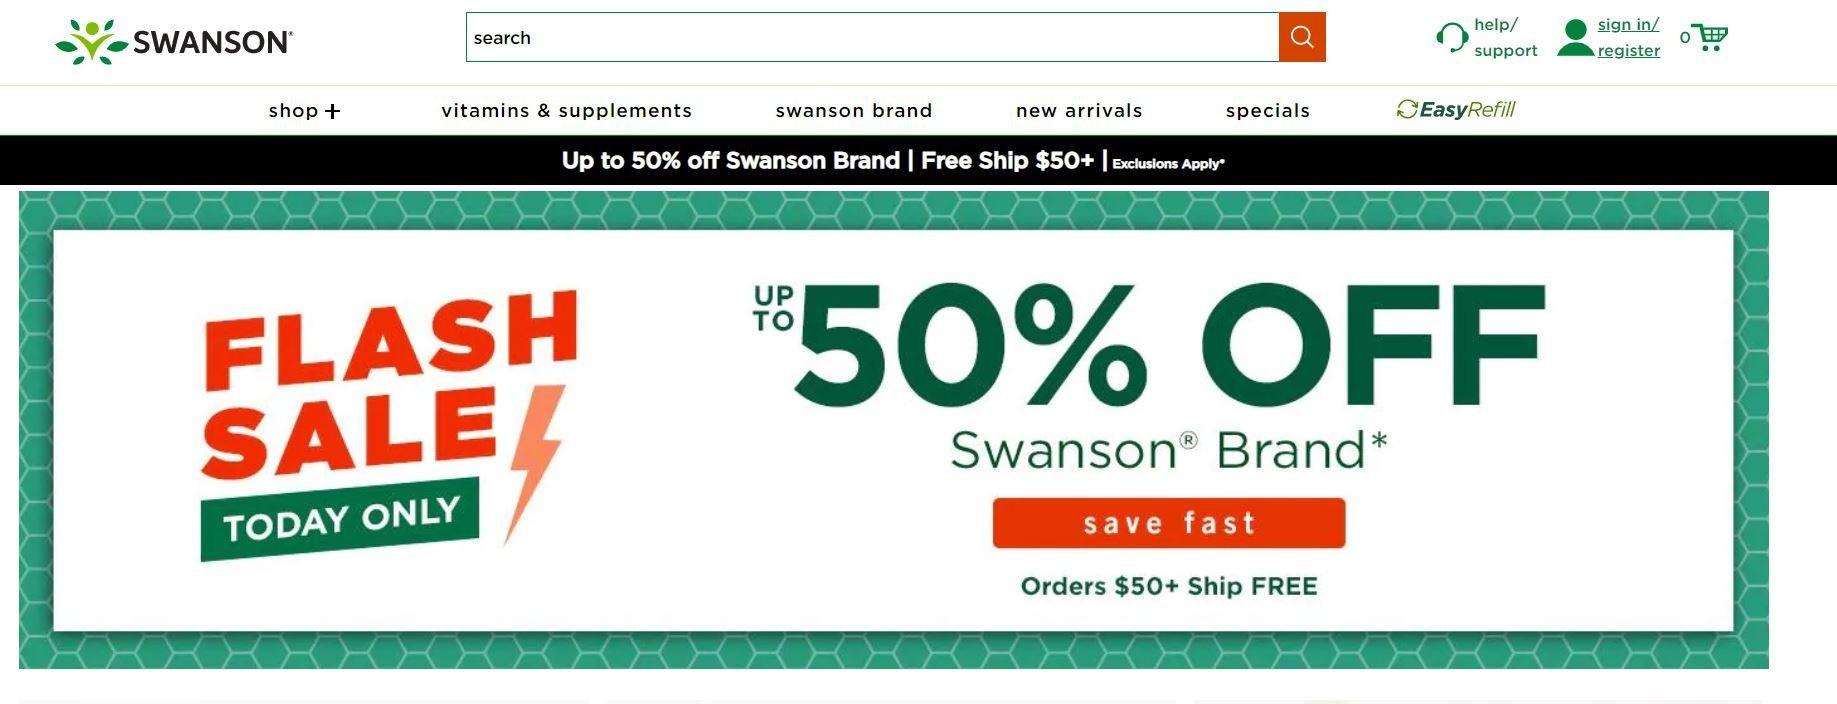 swansonvitamins - 2